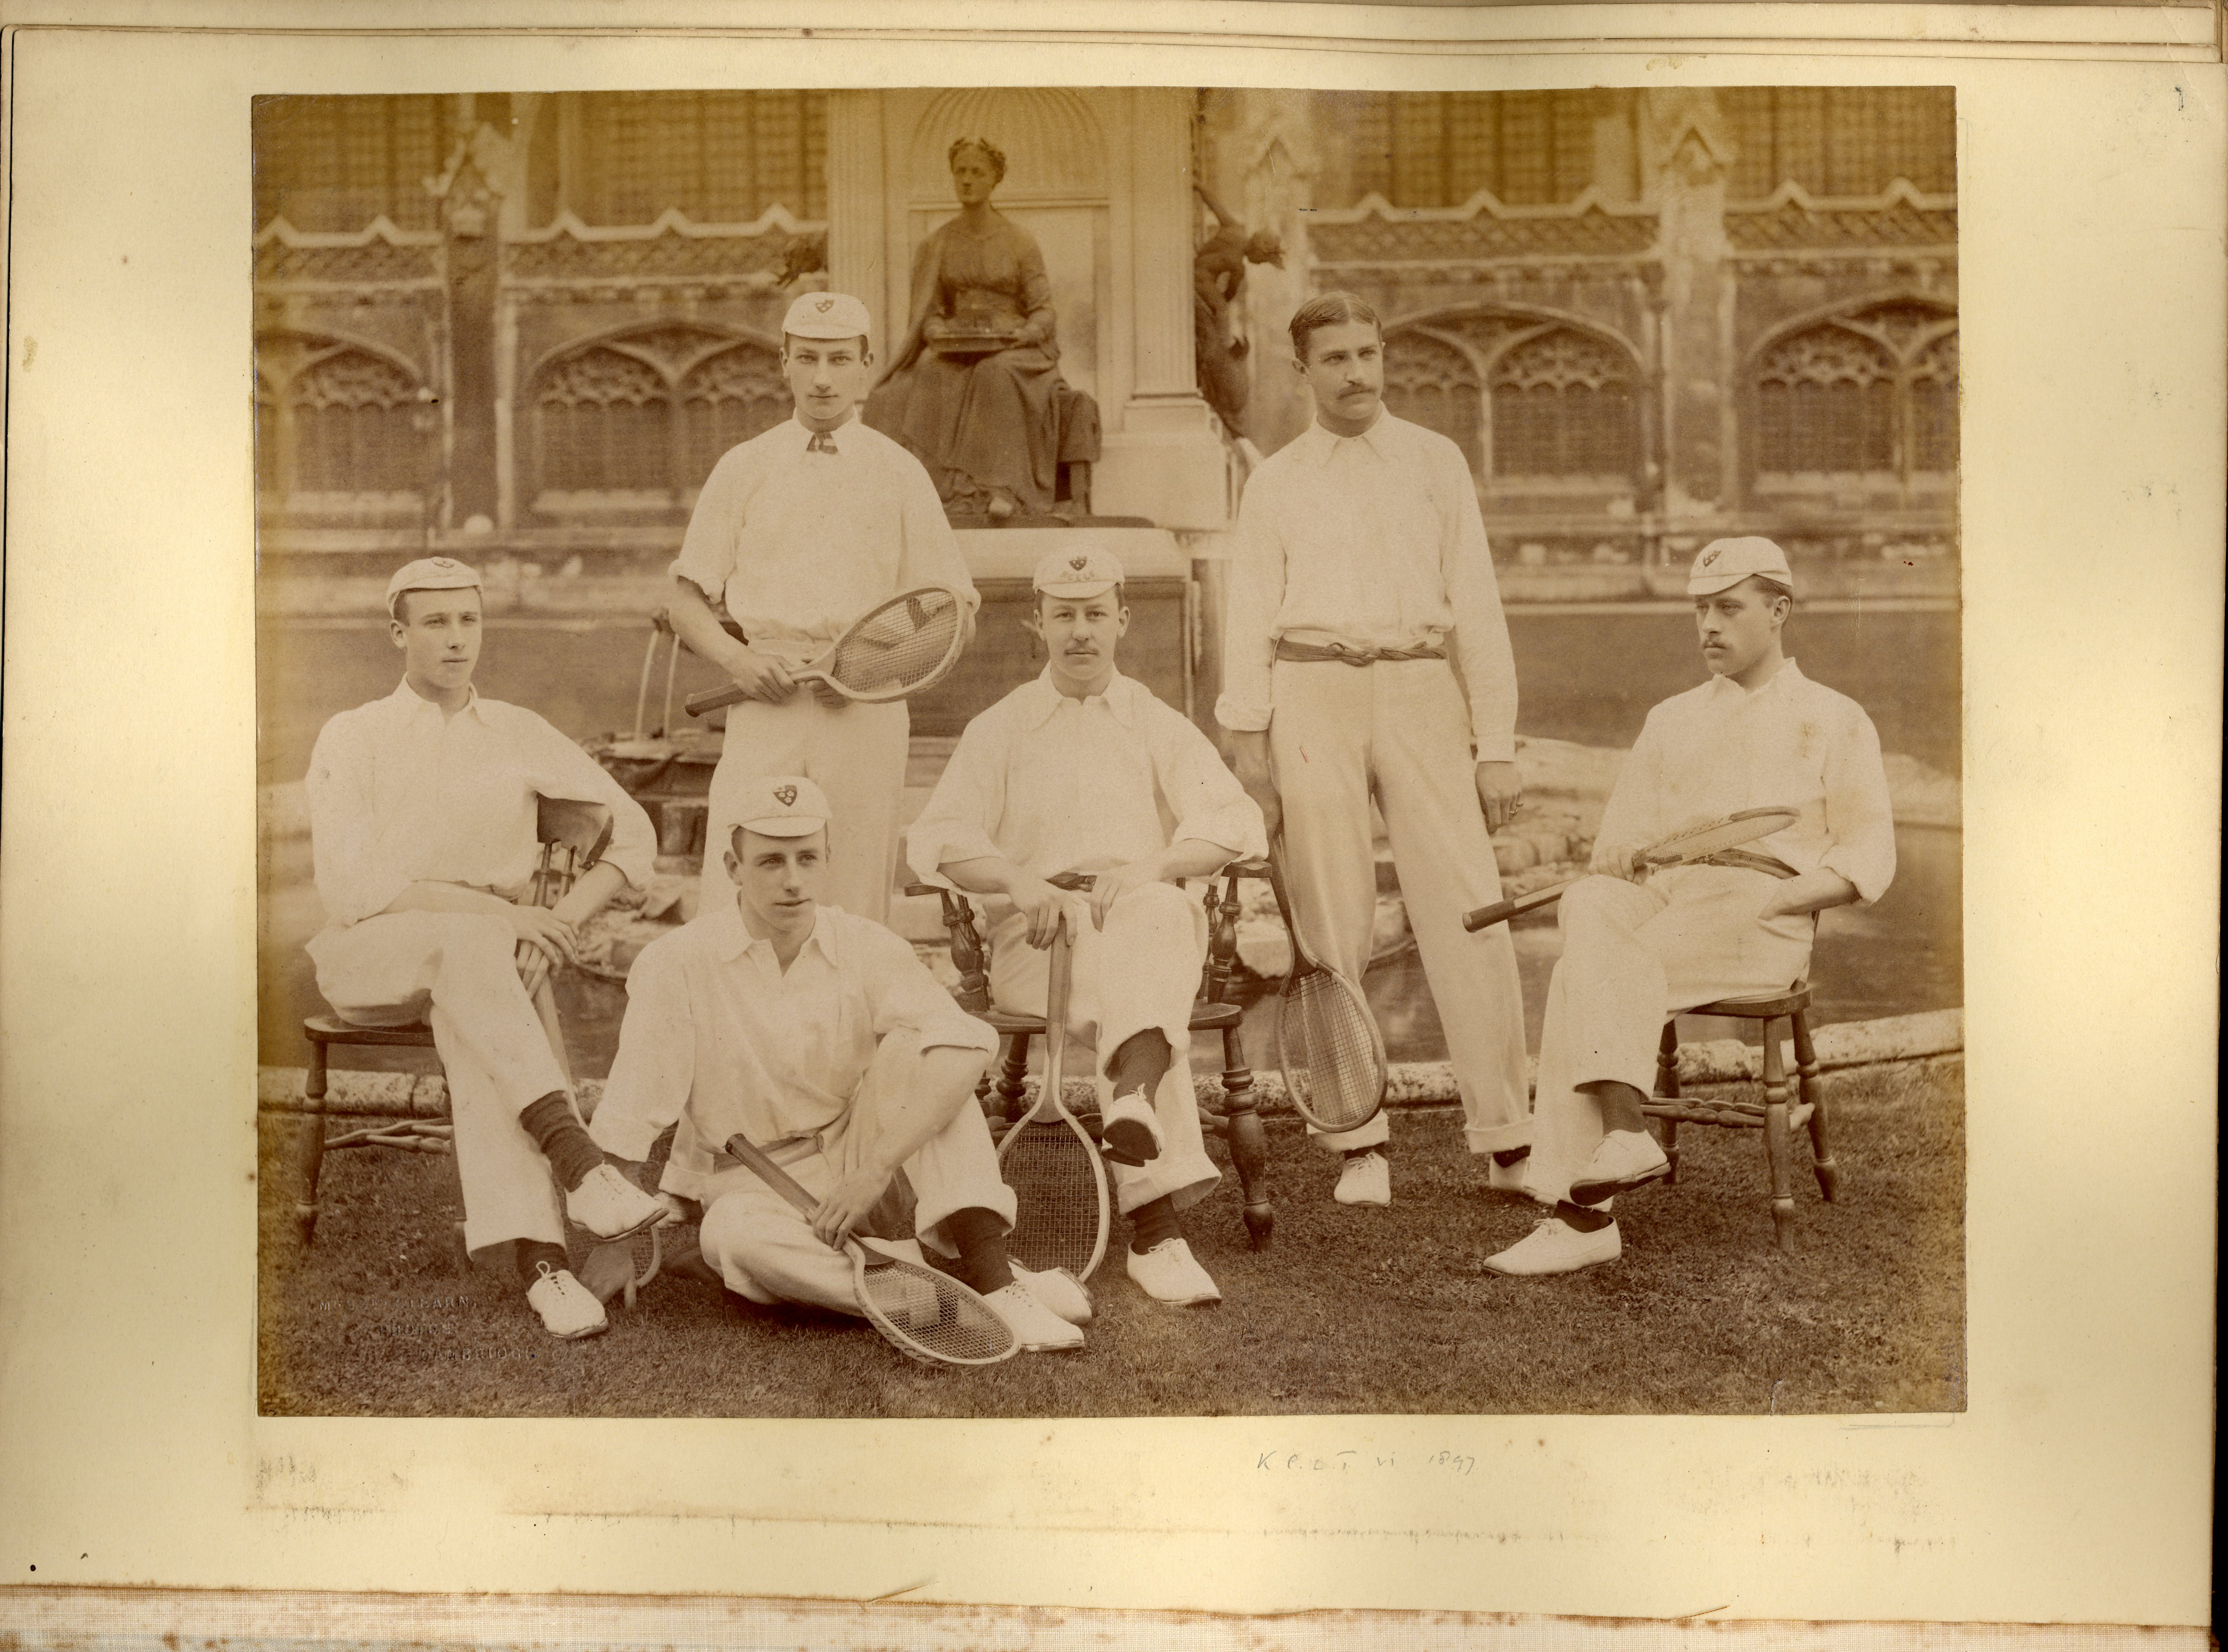 King's College Lawn Tennis team, 1897 [KCAC/1/3/6/4/1]